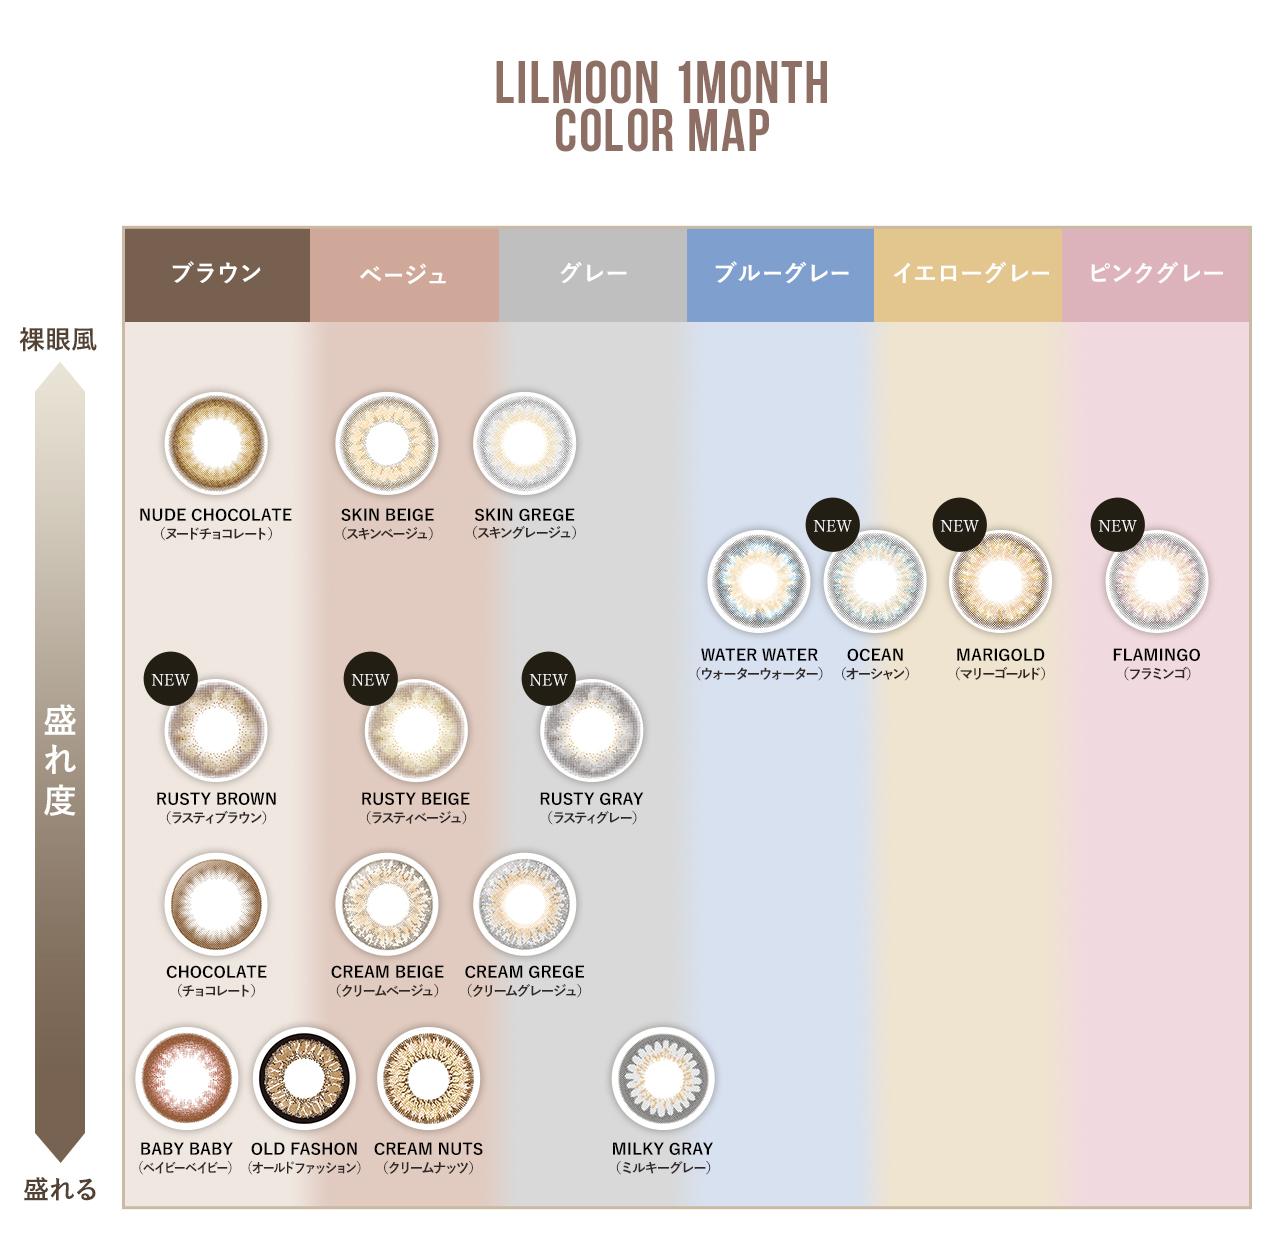 LILMOON11